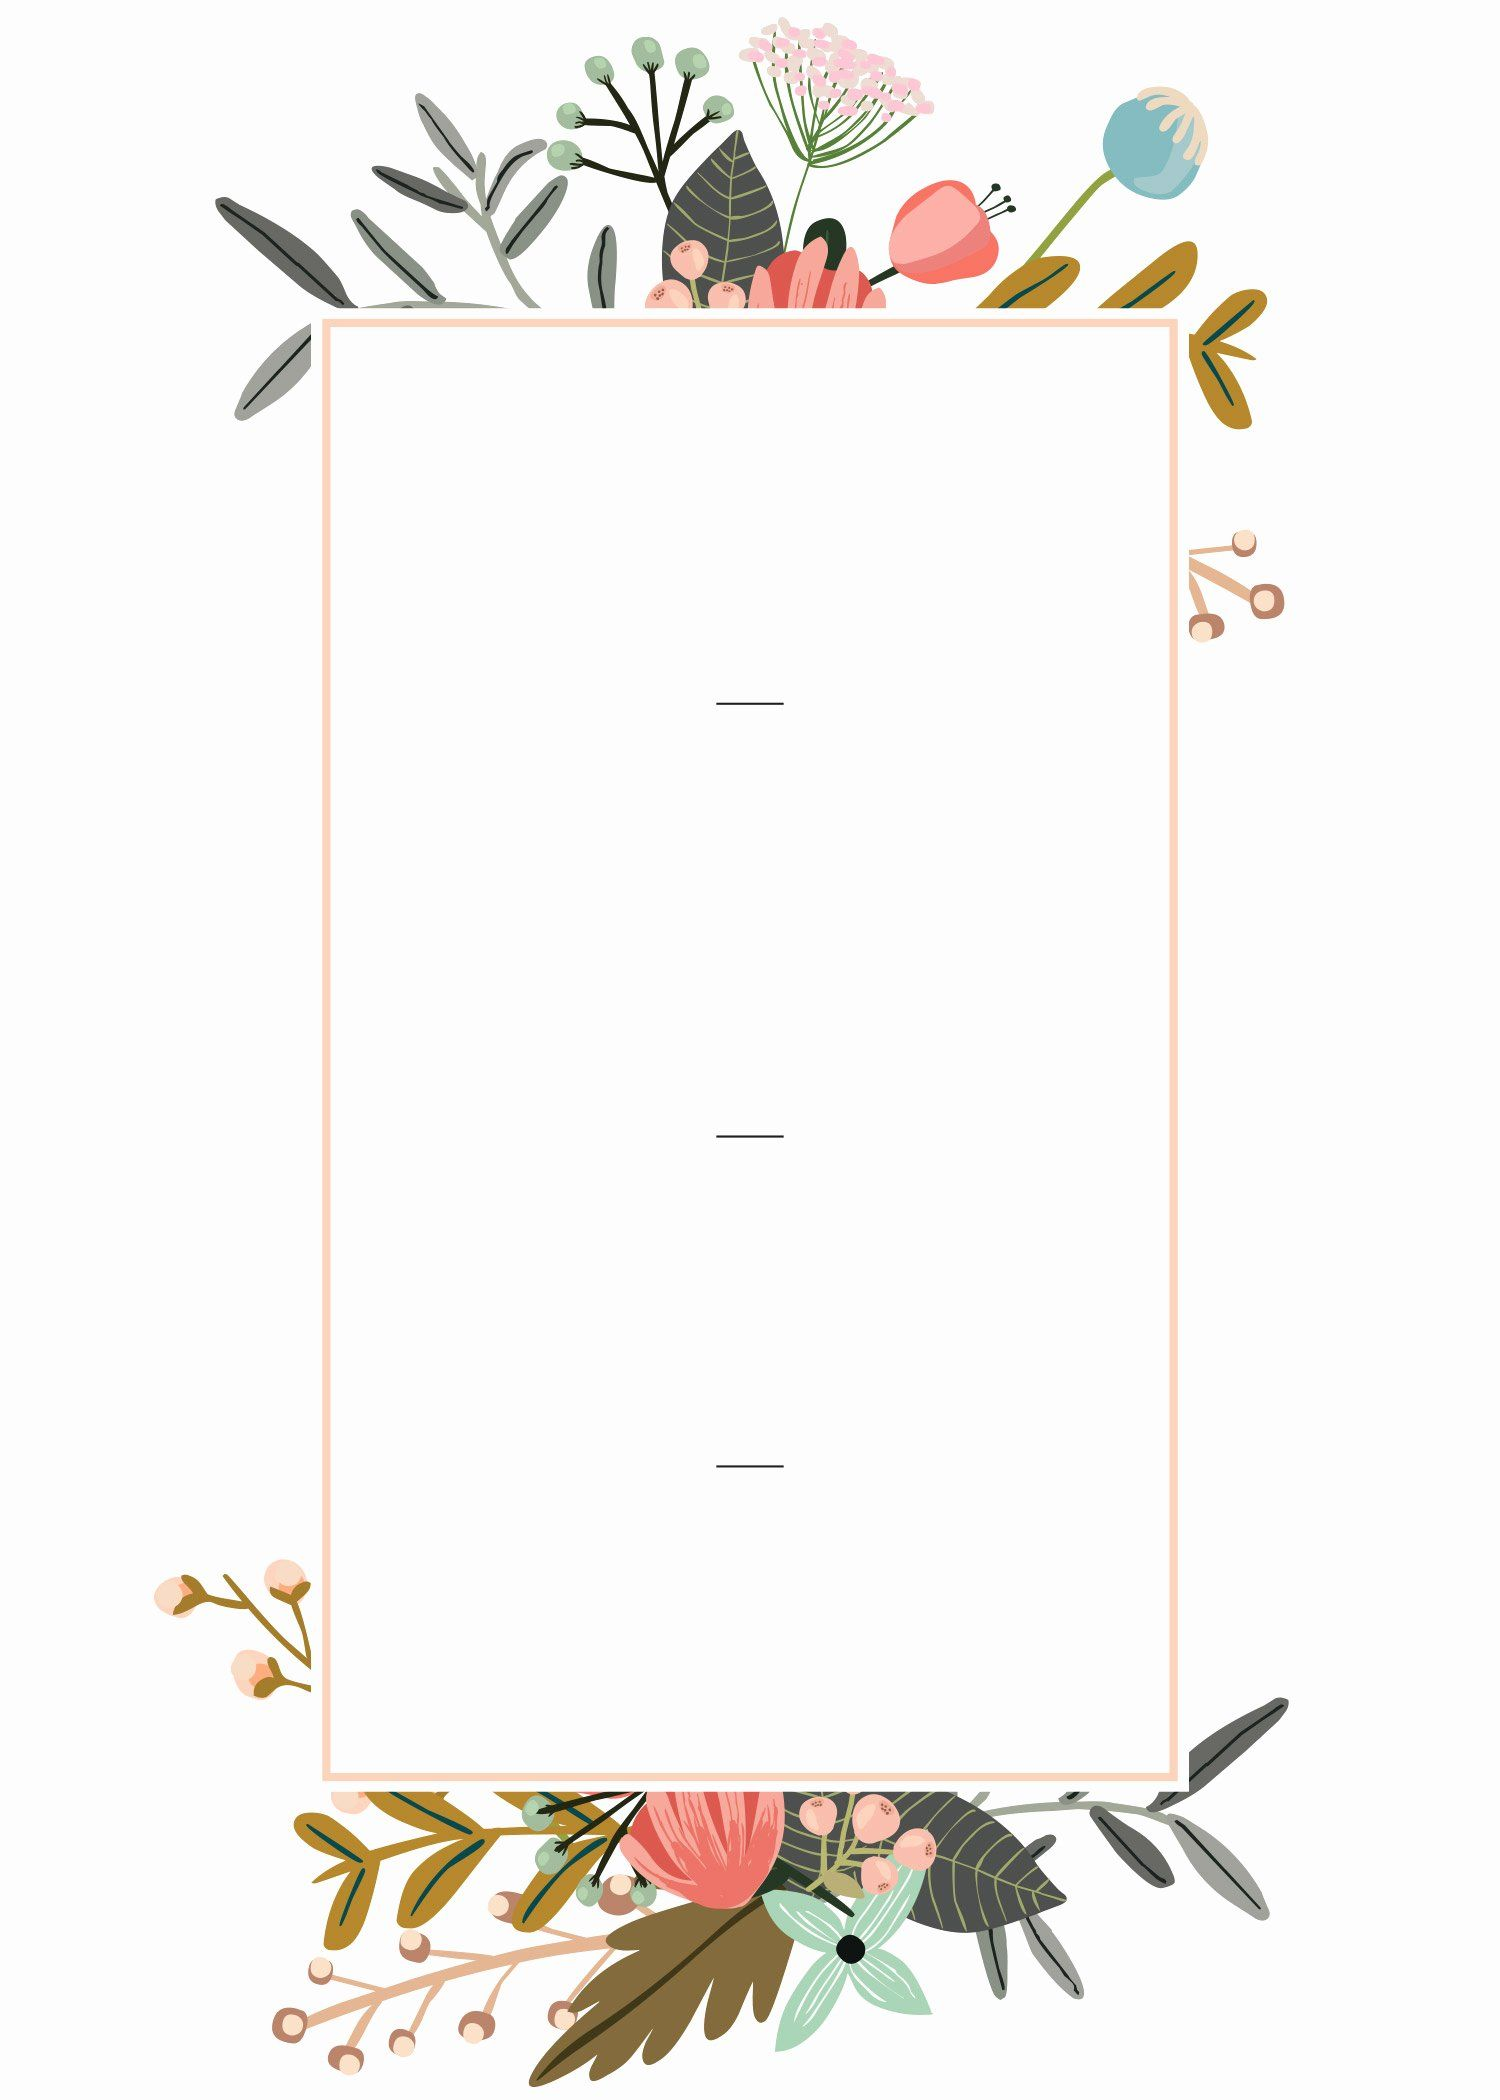 Wedding Invitations Template Free Download Lovely Editable Wedding In Wedding Invitation Layout Wedding Invitations Printable Templates Fun Wedding Invitations